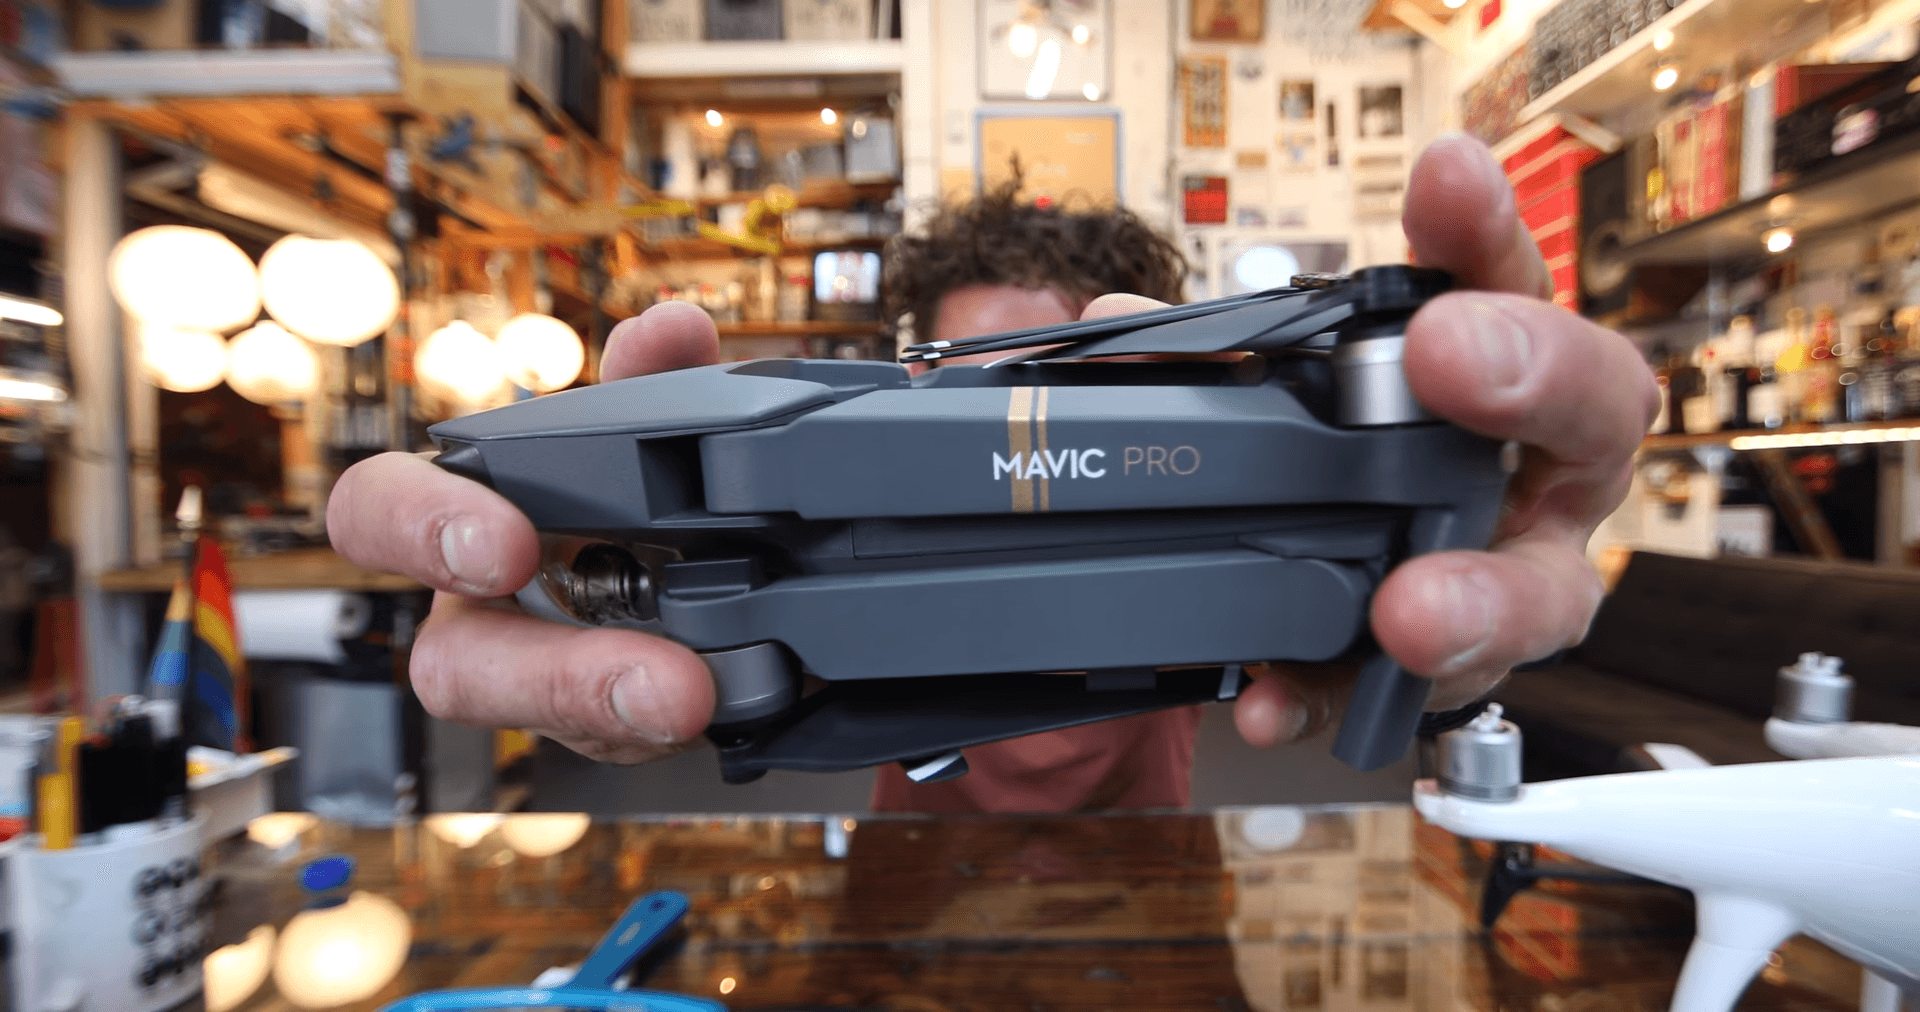 The DJI Mavic Pro footage looks like a cheap HD action